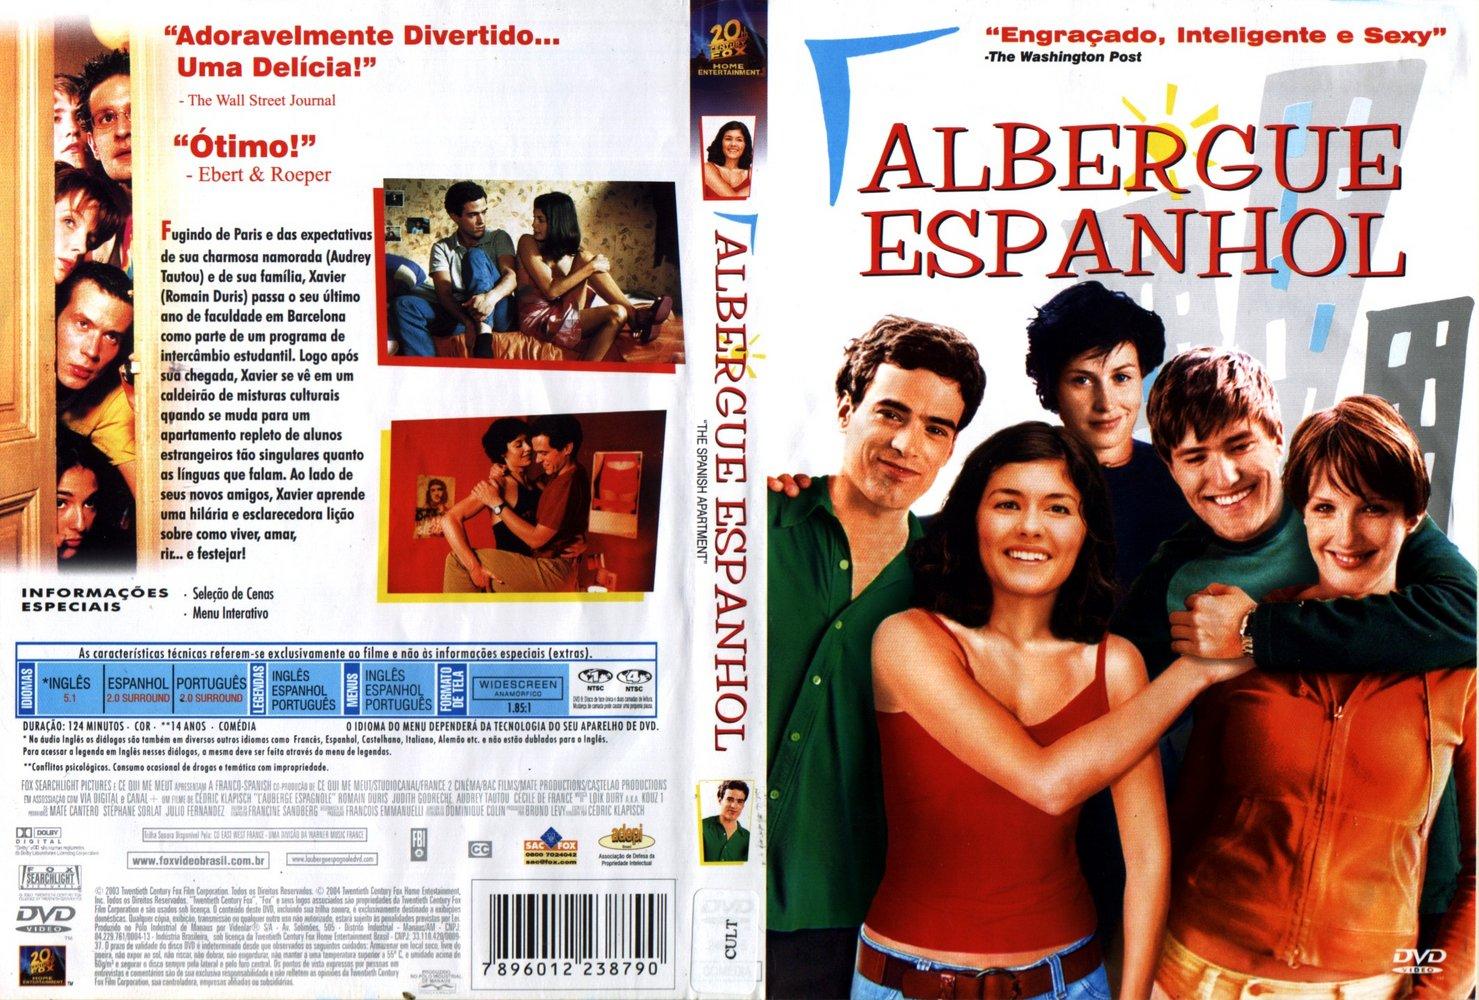 http://4.bp.blogspot.com/_avx0CDv74_c/TCo9qyAk0eI/AAAAAAAAAB0/VCB0839Dpqs/s1600/Albergue+Espanhol_.jpg